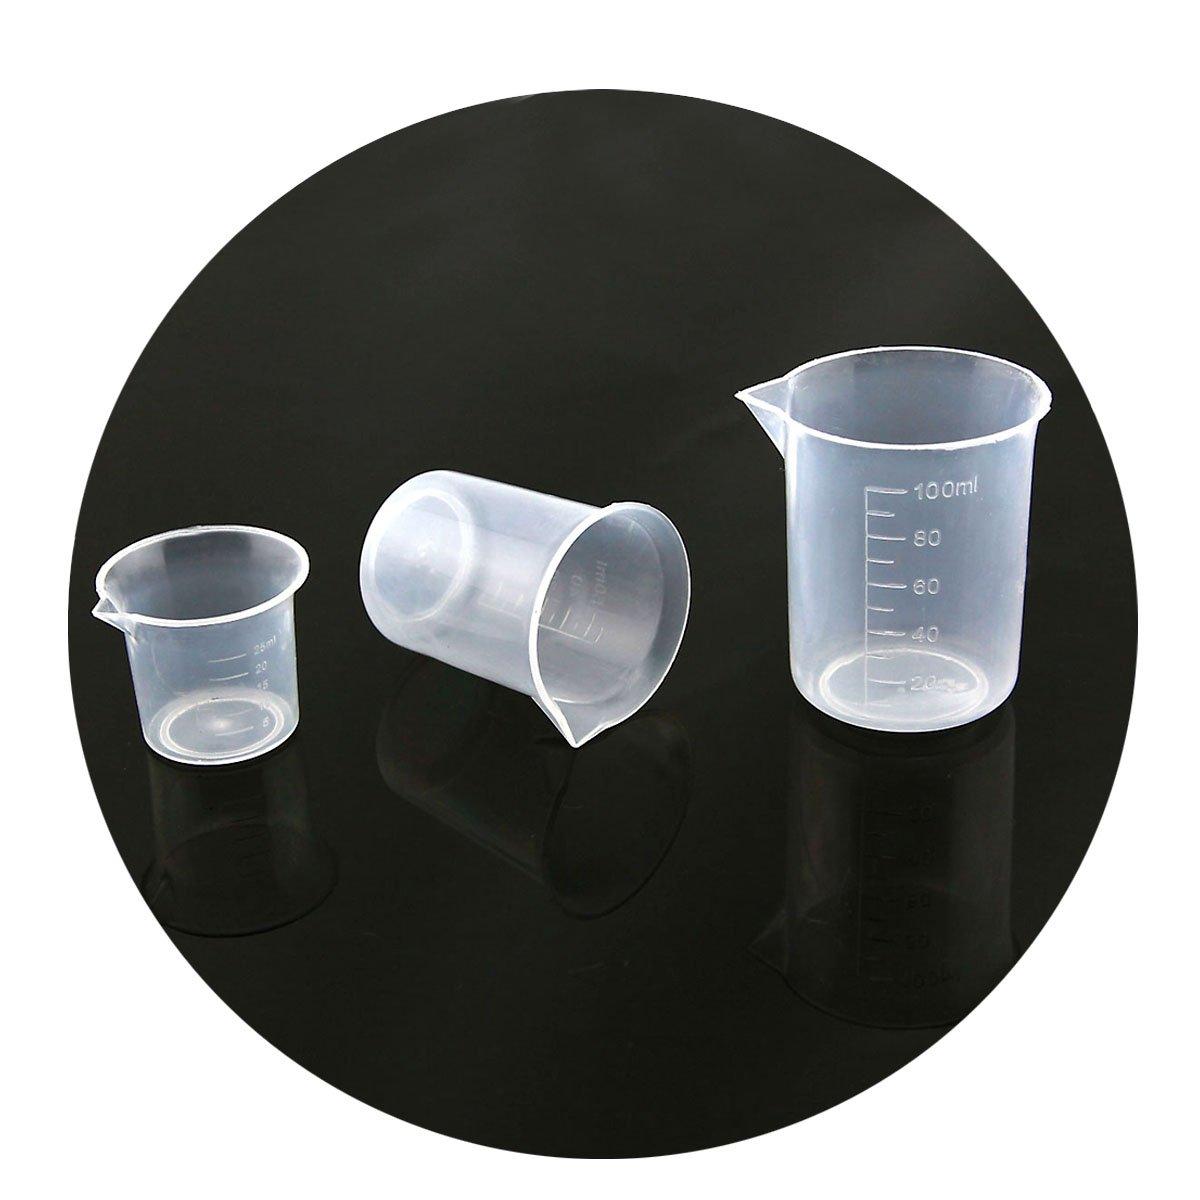 Owfeel A Set of 3 latest 100mL Houston Mall Plastic Beaker 50mL Set-25mL